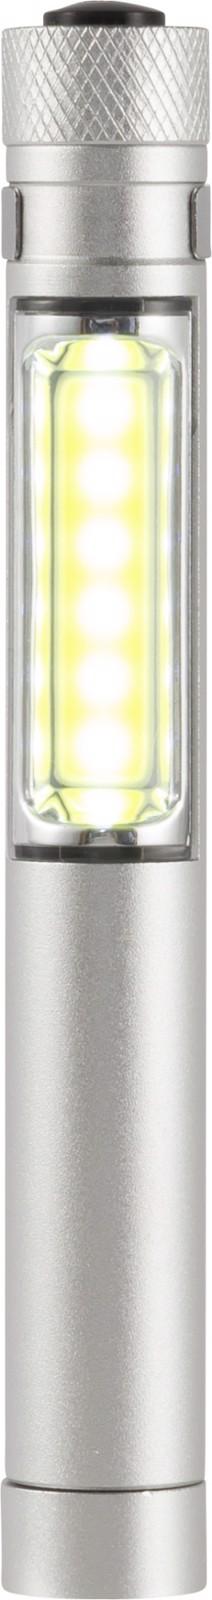 Aluminium torch - Silver